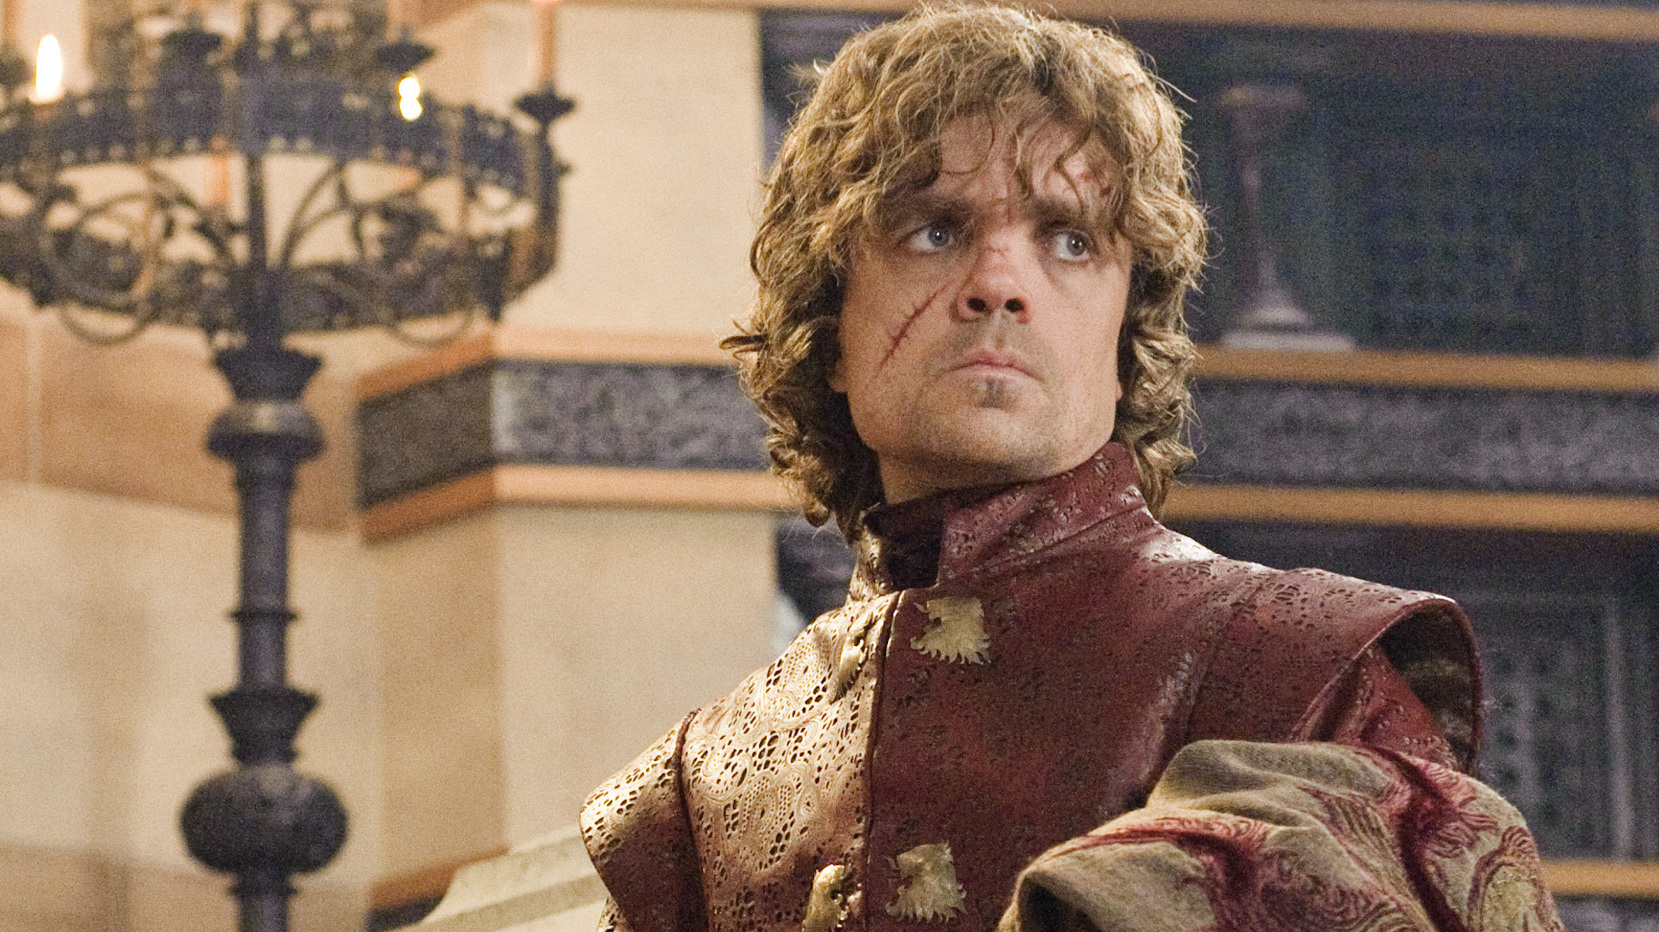 Social Media Game of Thrones - SWOT analysis